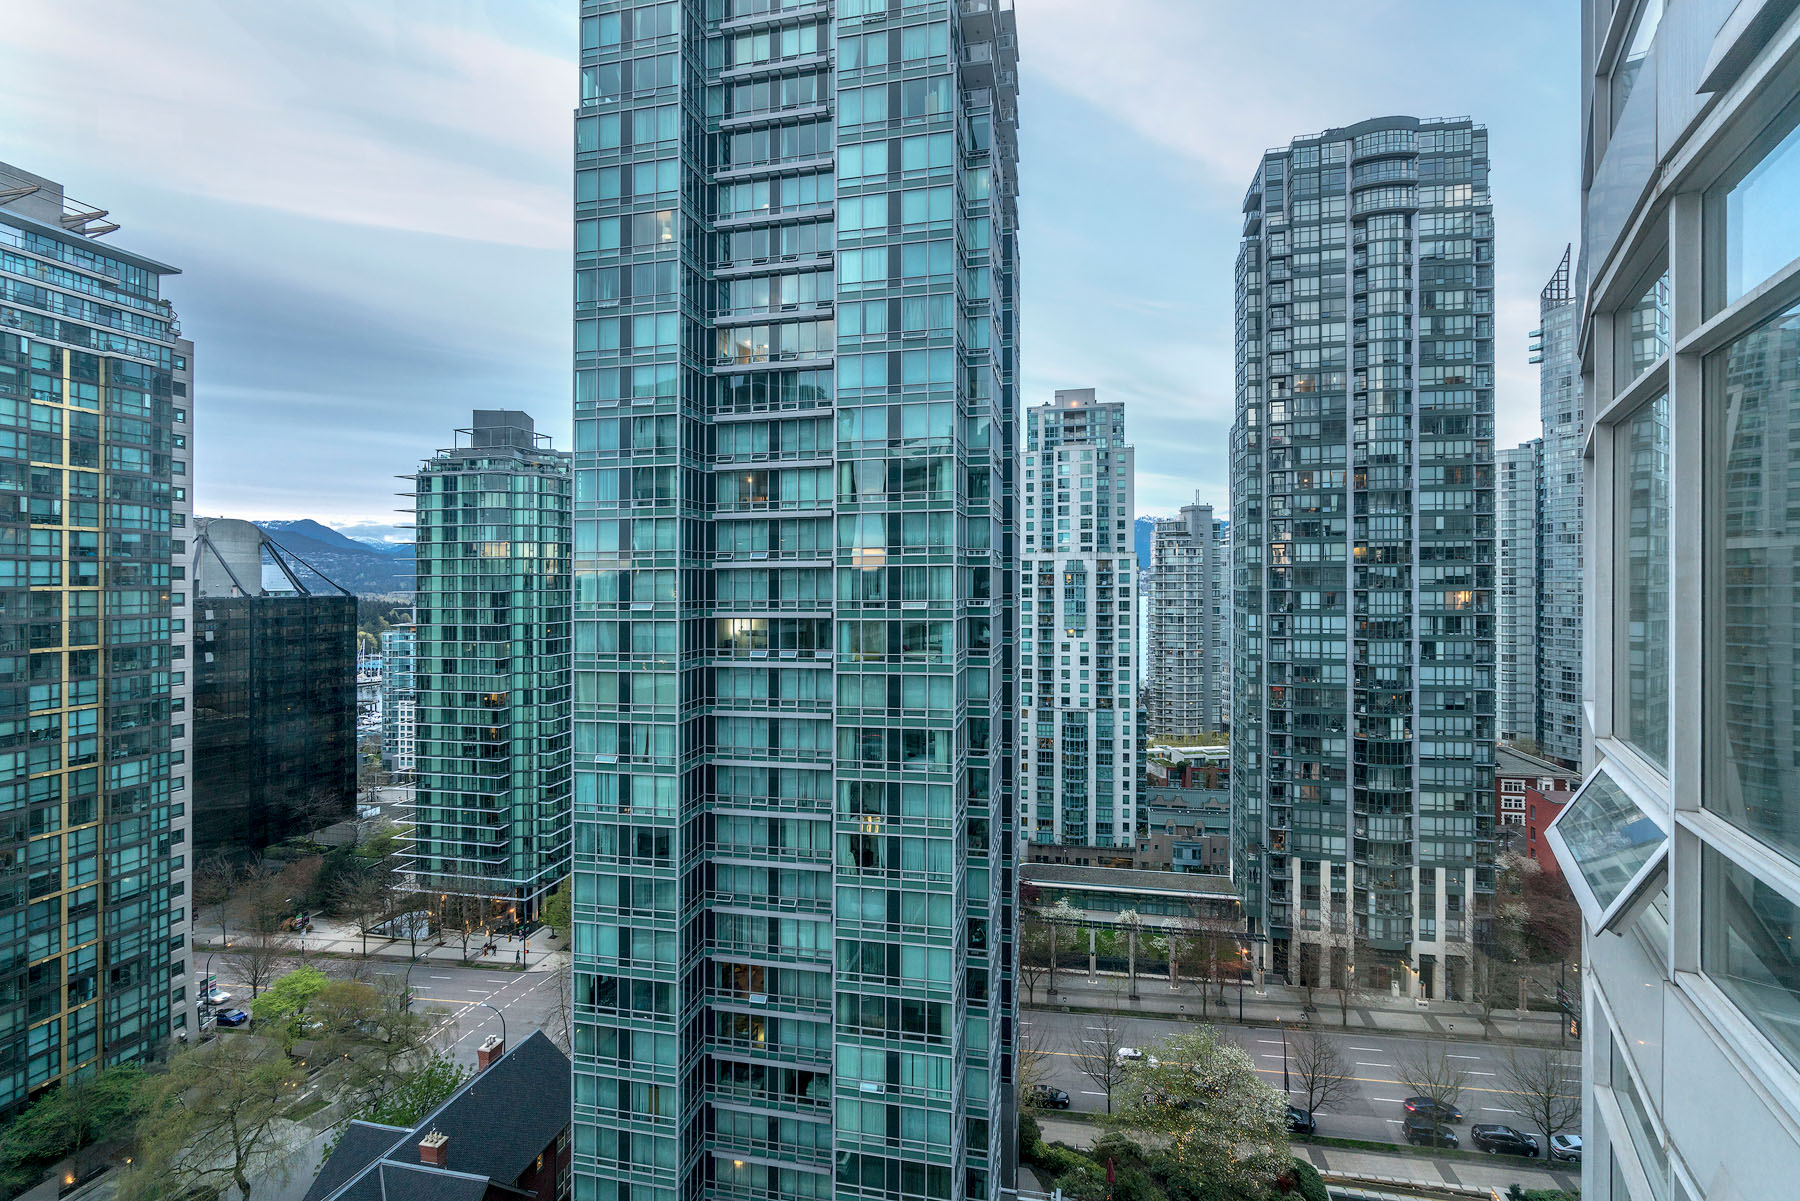 1605-1288-Alberni-Street-Vancouver-360hometours-24s.jpg